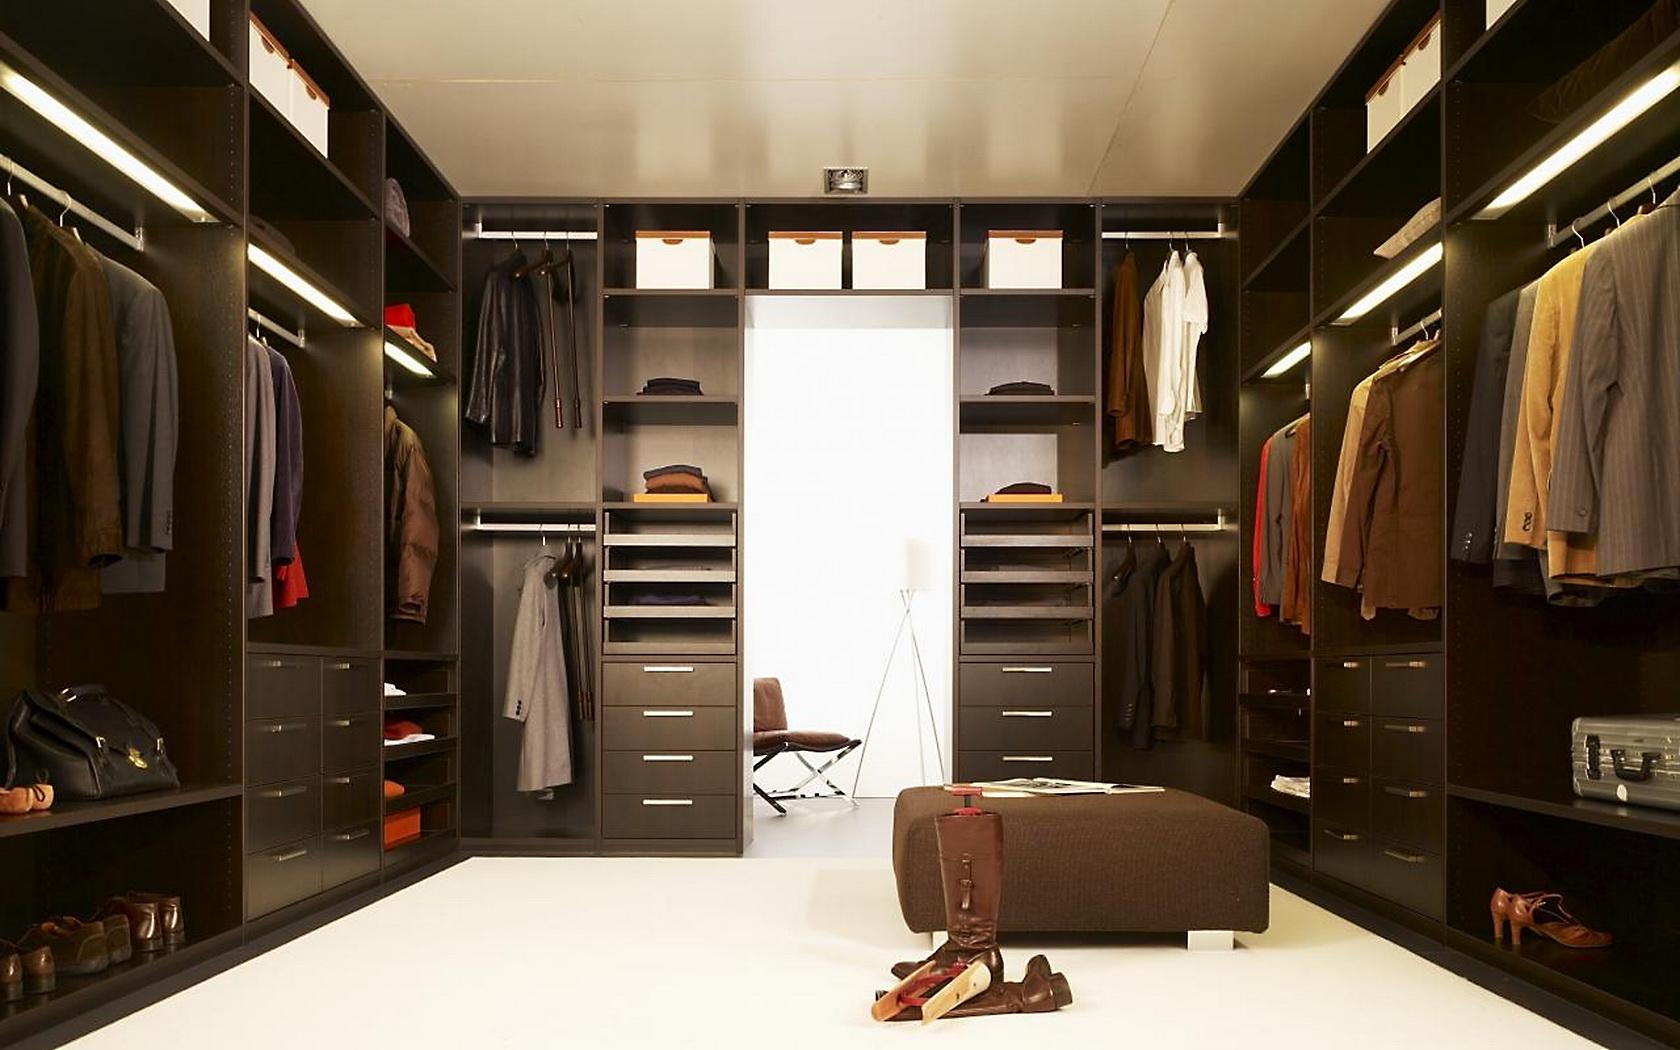 Interior Design Elegant Dark Brown Wardrobe Closet With Two Row 1680x1050